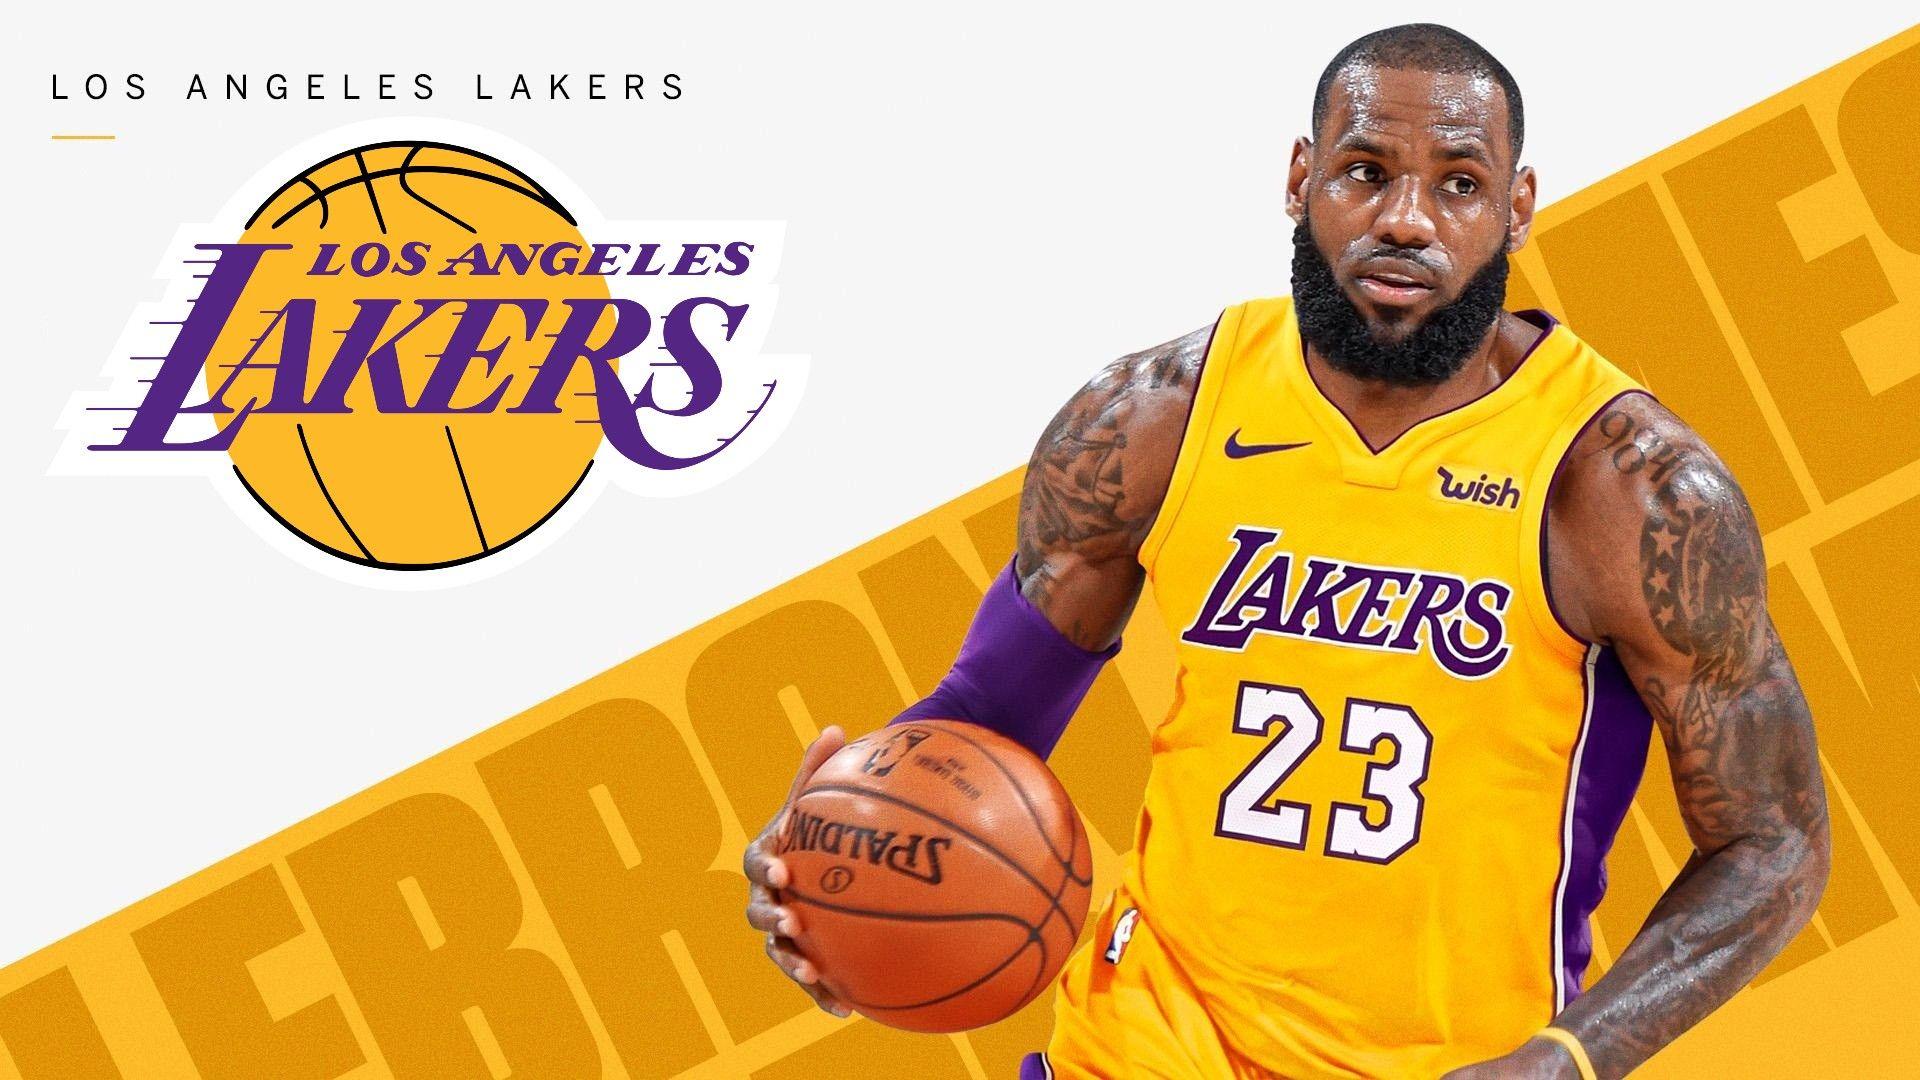 Lebron James Lakers Wallpaper Hd Lebron James Lakers Lebron James Lakers Wallpaper